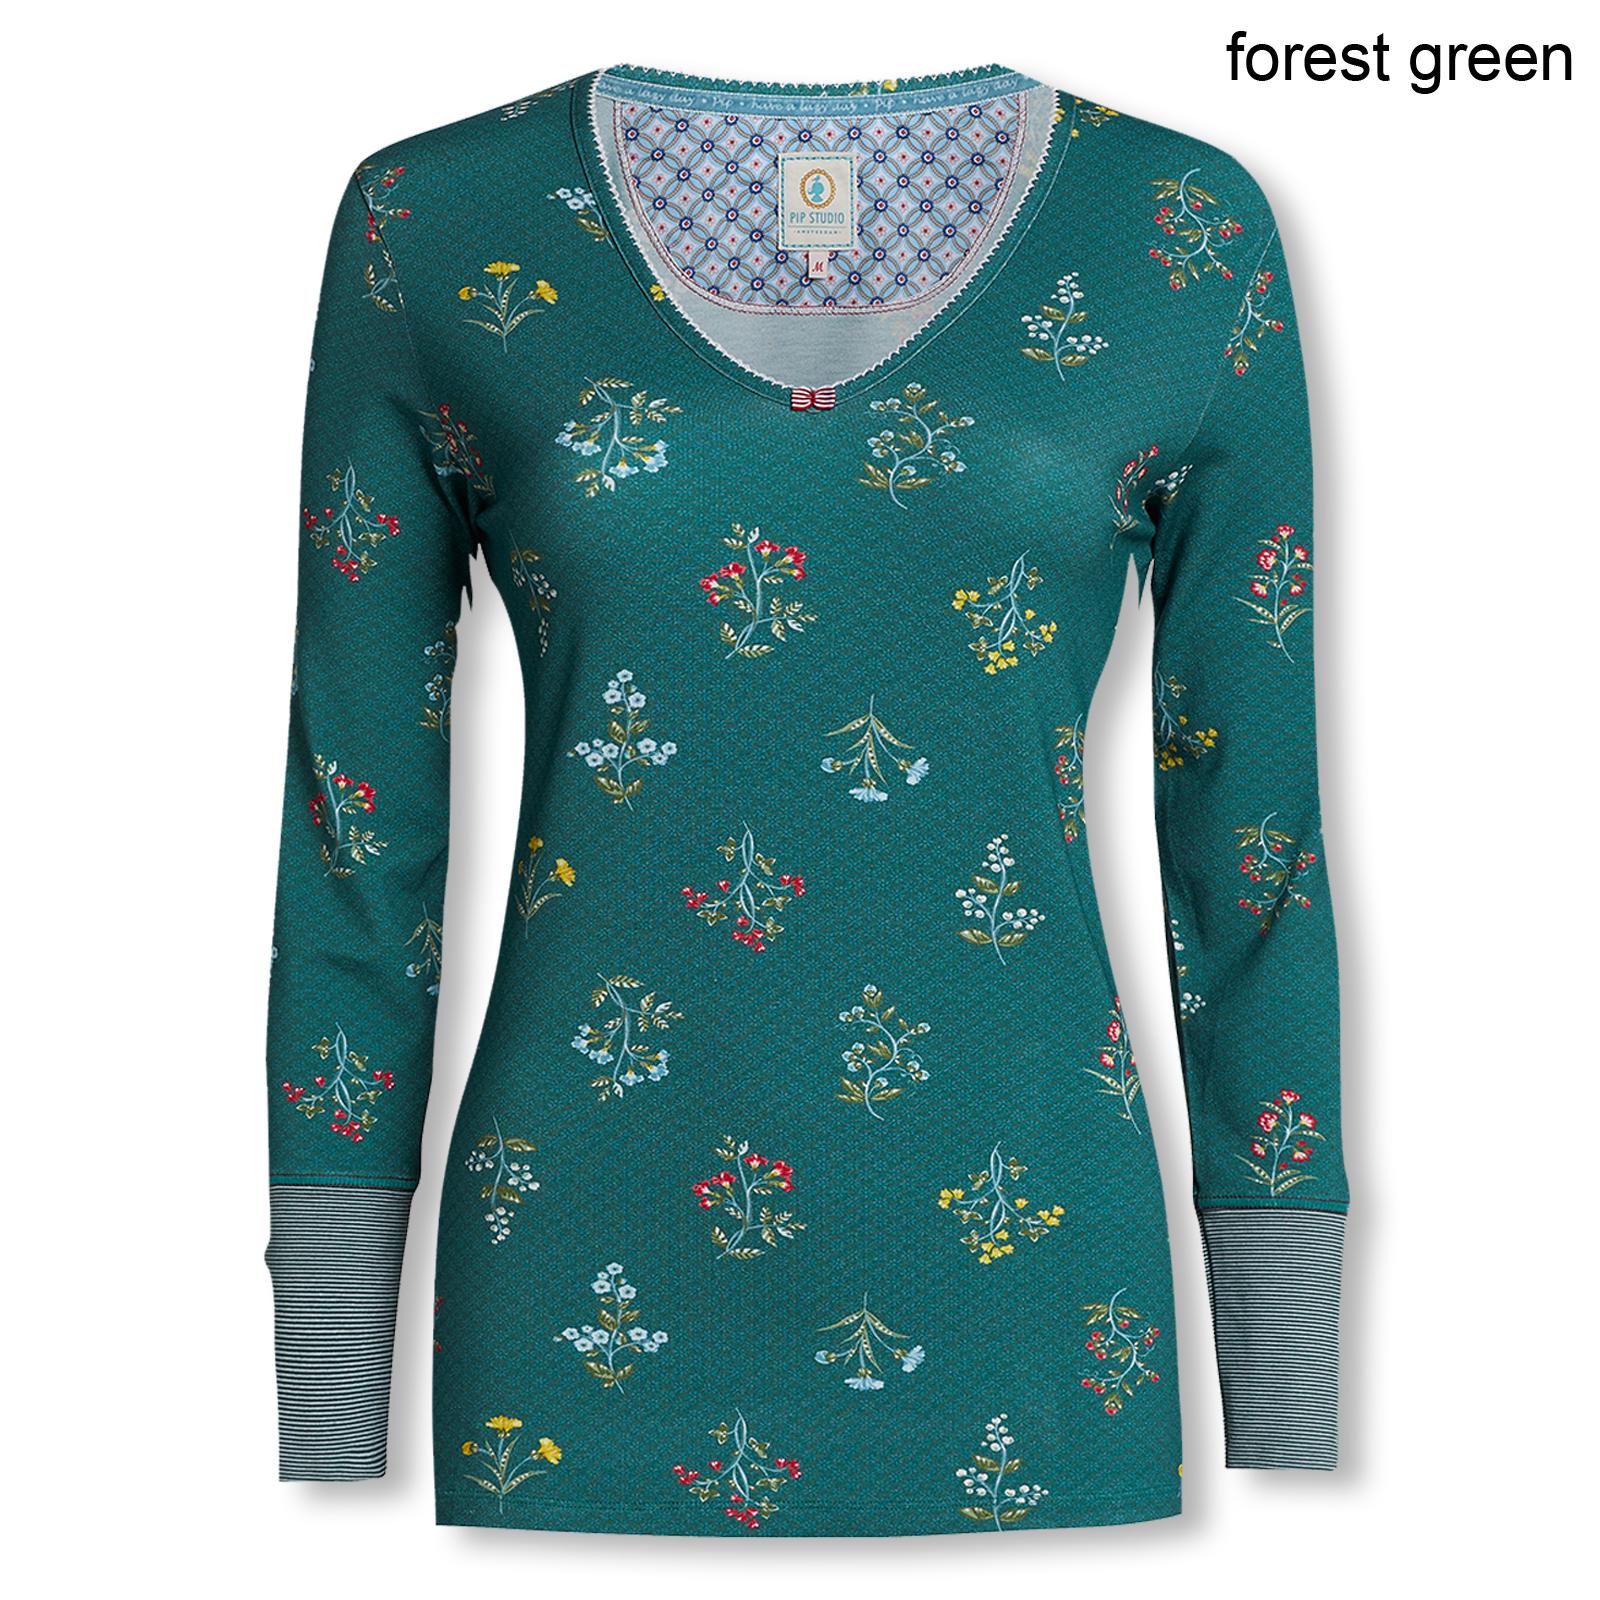 PiP Studio Damen Long Sleeve Langarmshirt Trix Winter Wonderland 260760 S M L XL in forest green